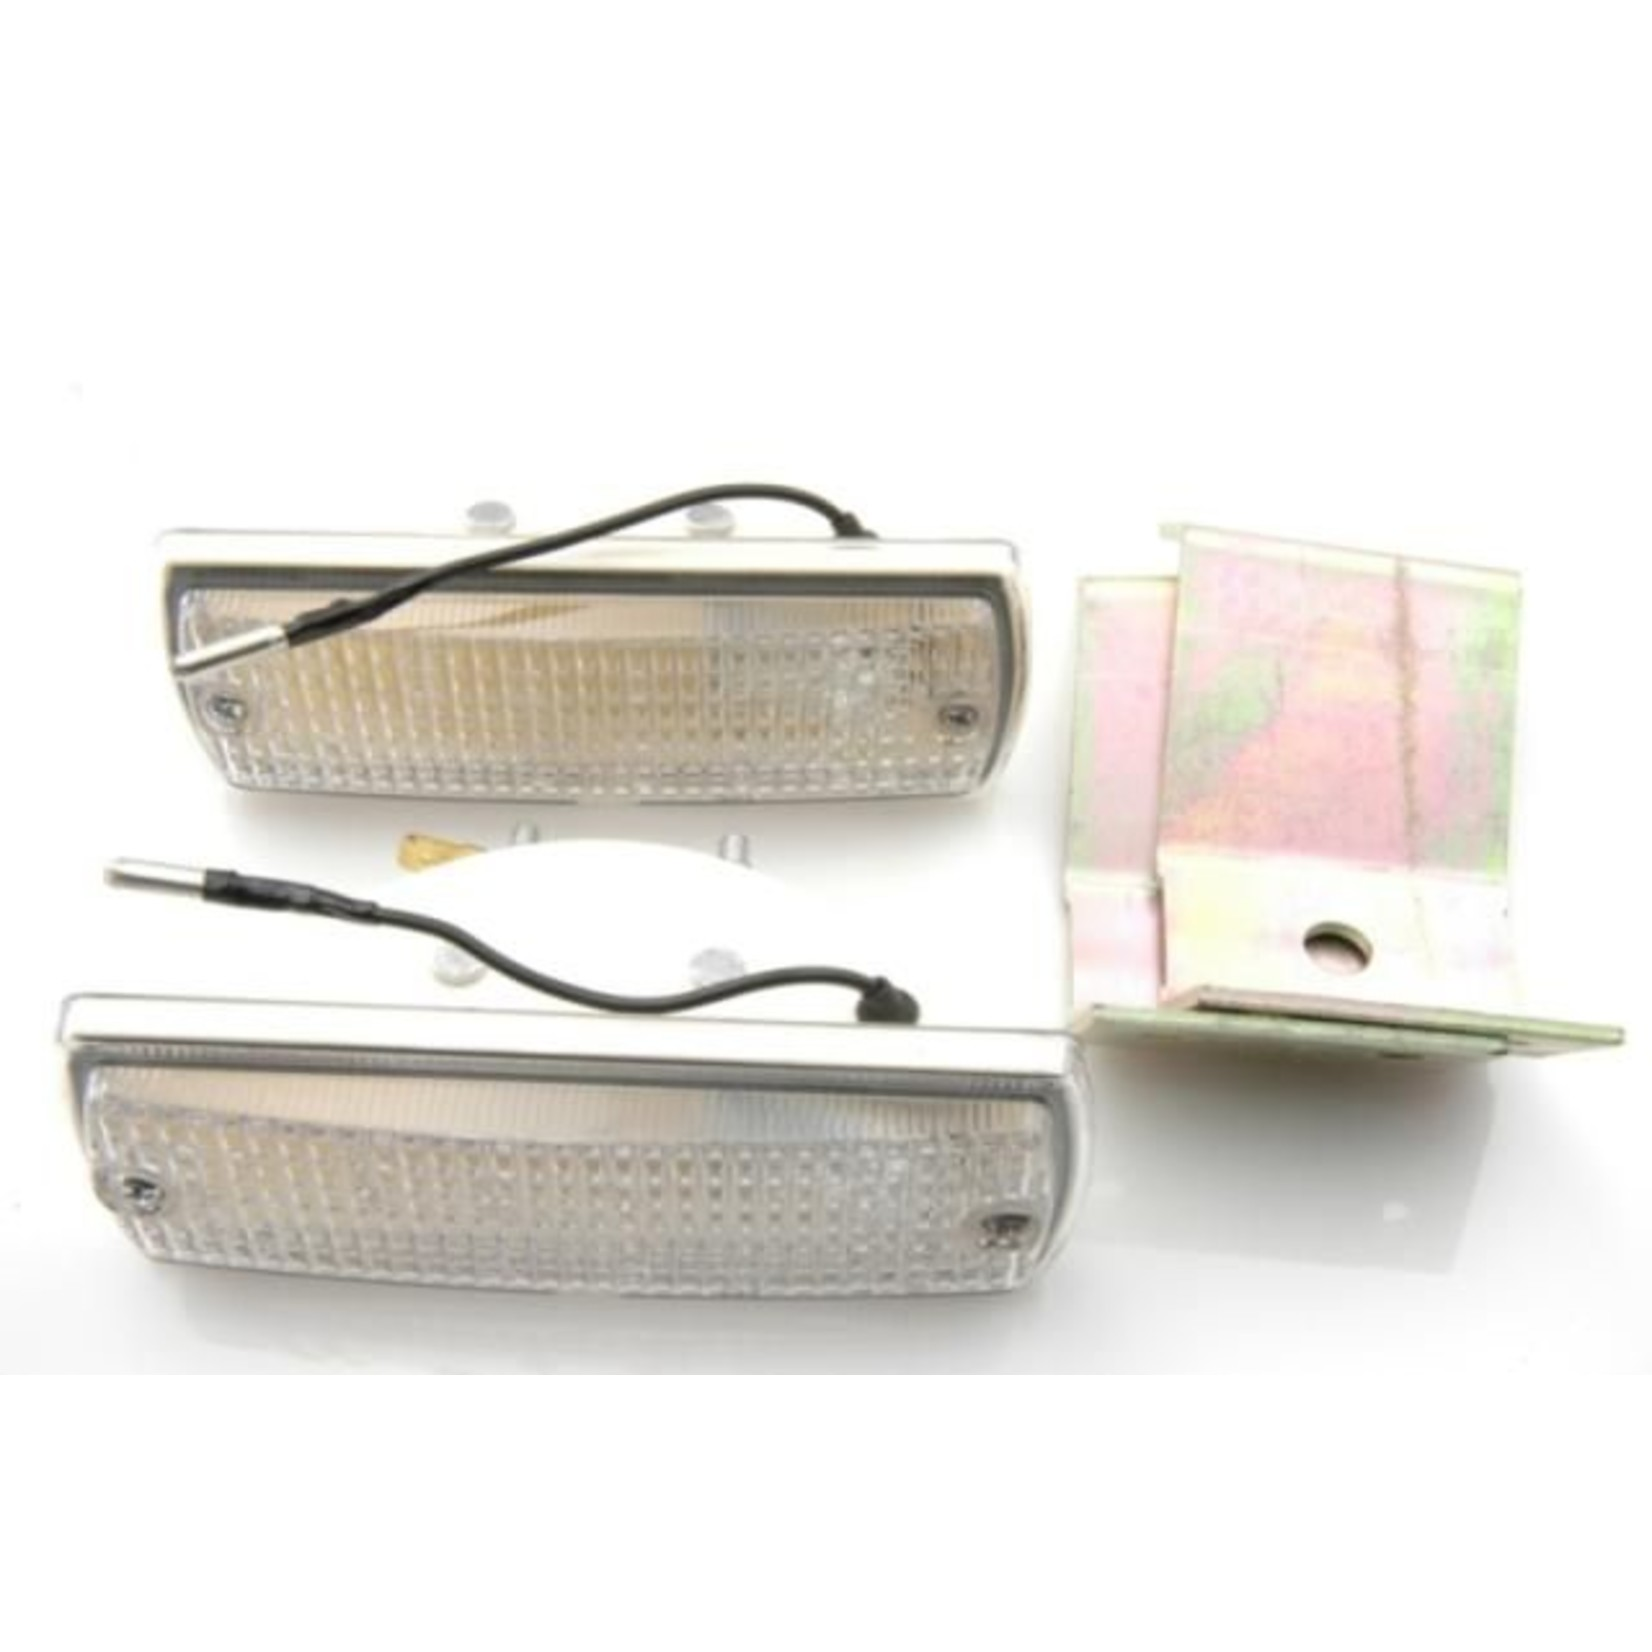 Reversing lights + lugs 73-75 Nr Org: 5434988